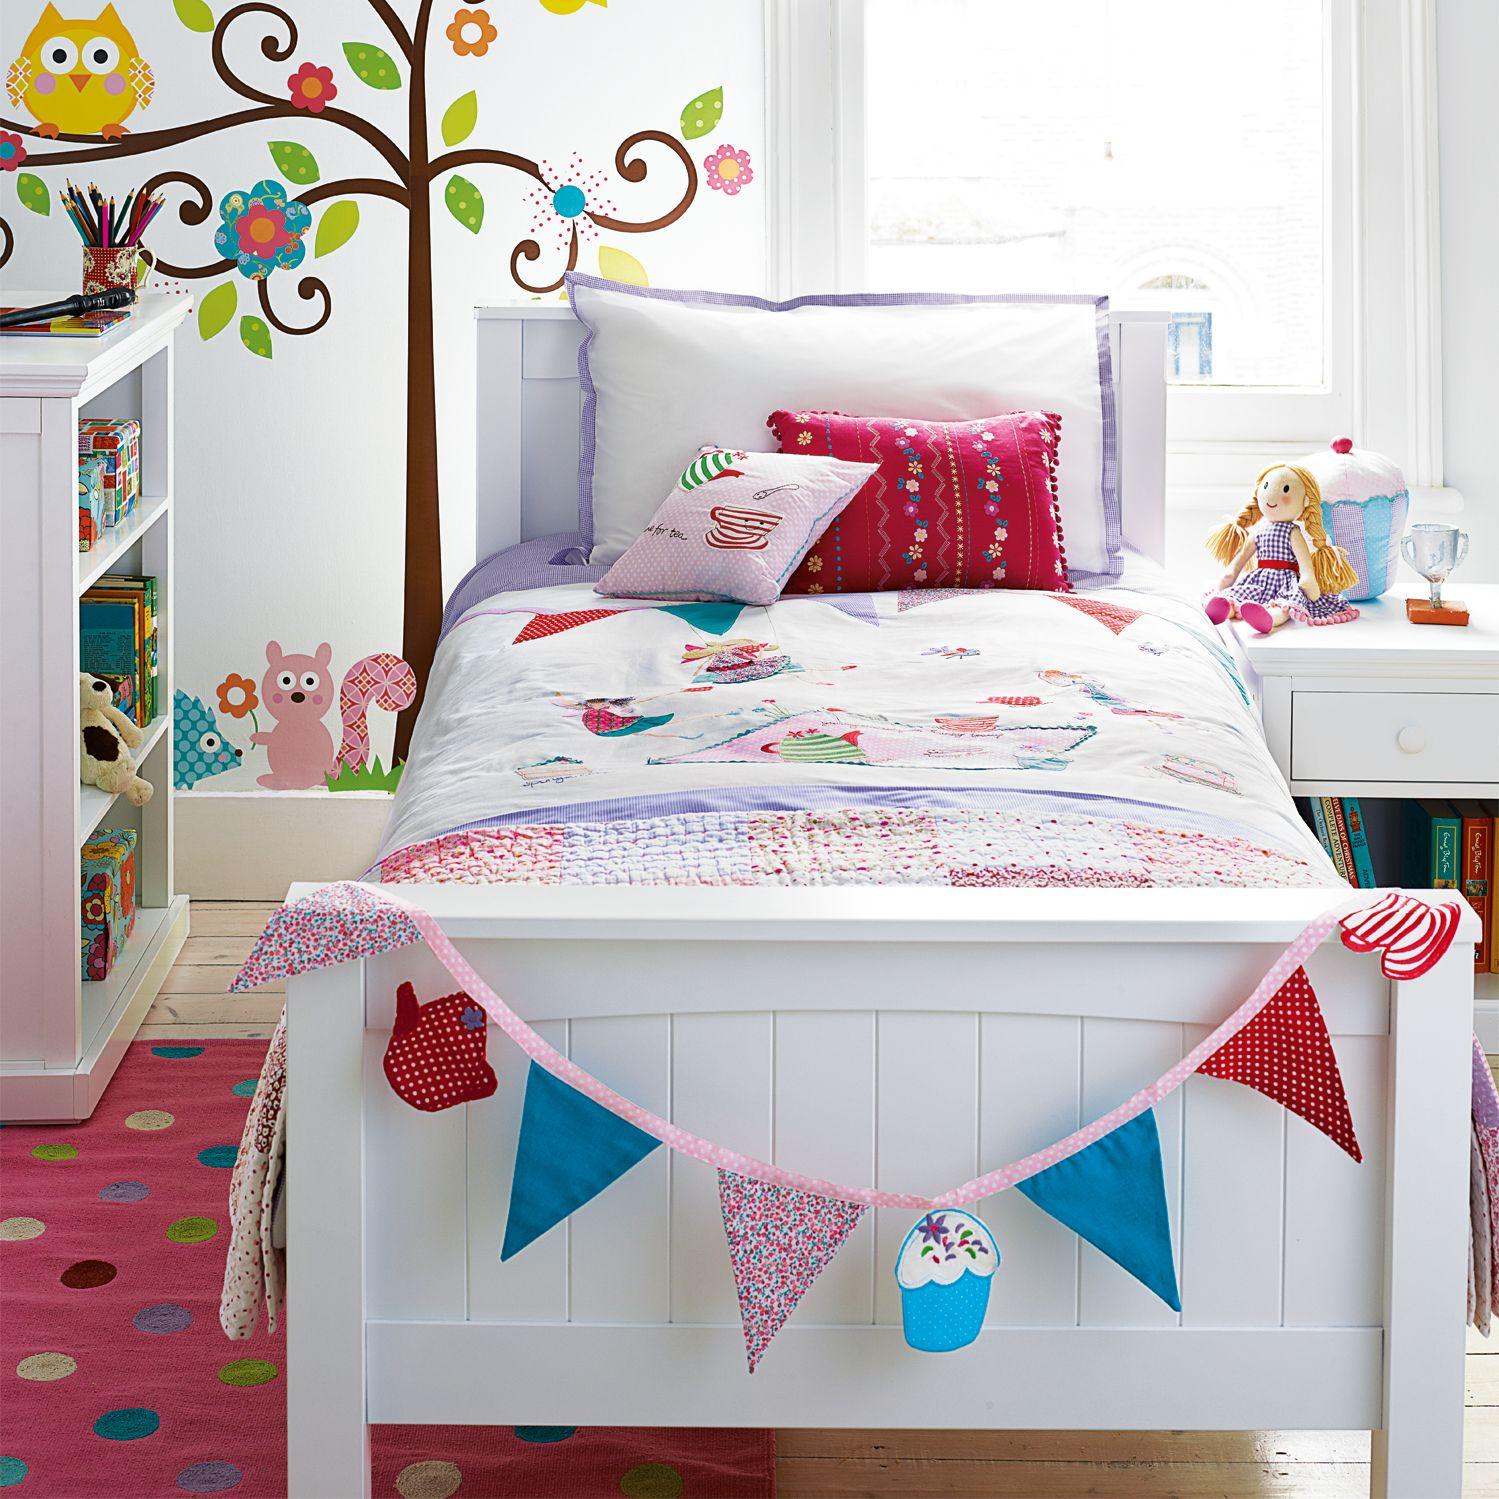 Little Home At John Lewis Fairy Tea Party Children S Duvet Cover And Pillowcase Set